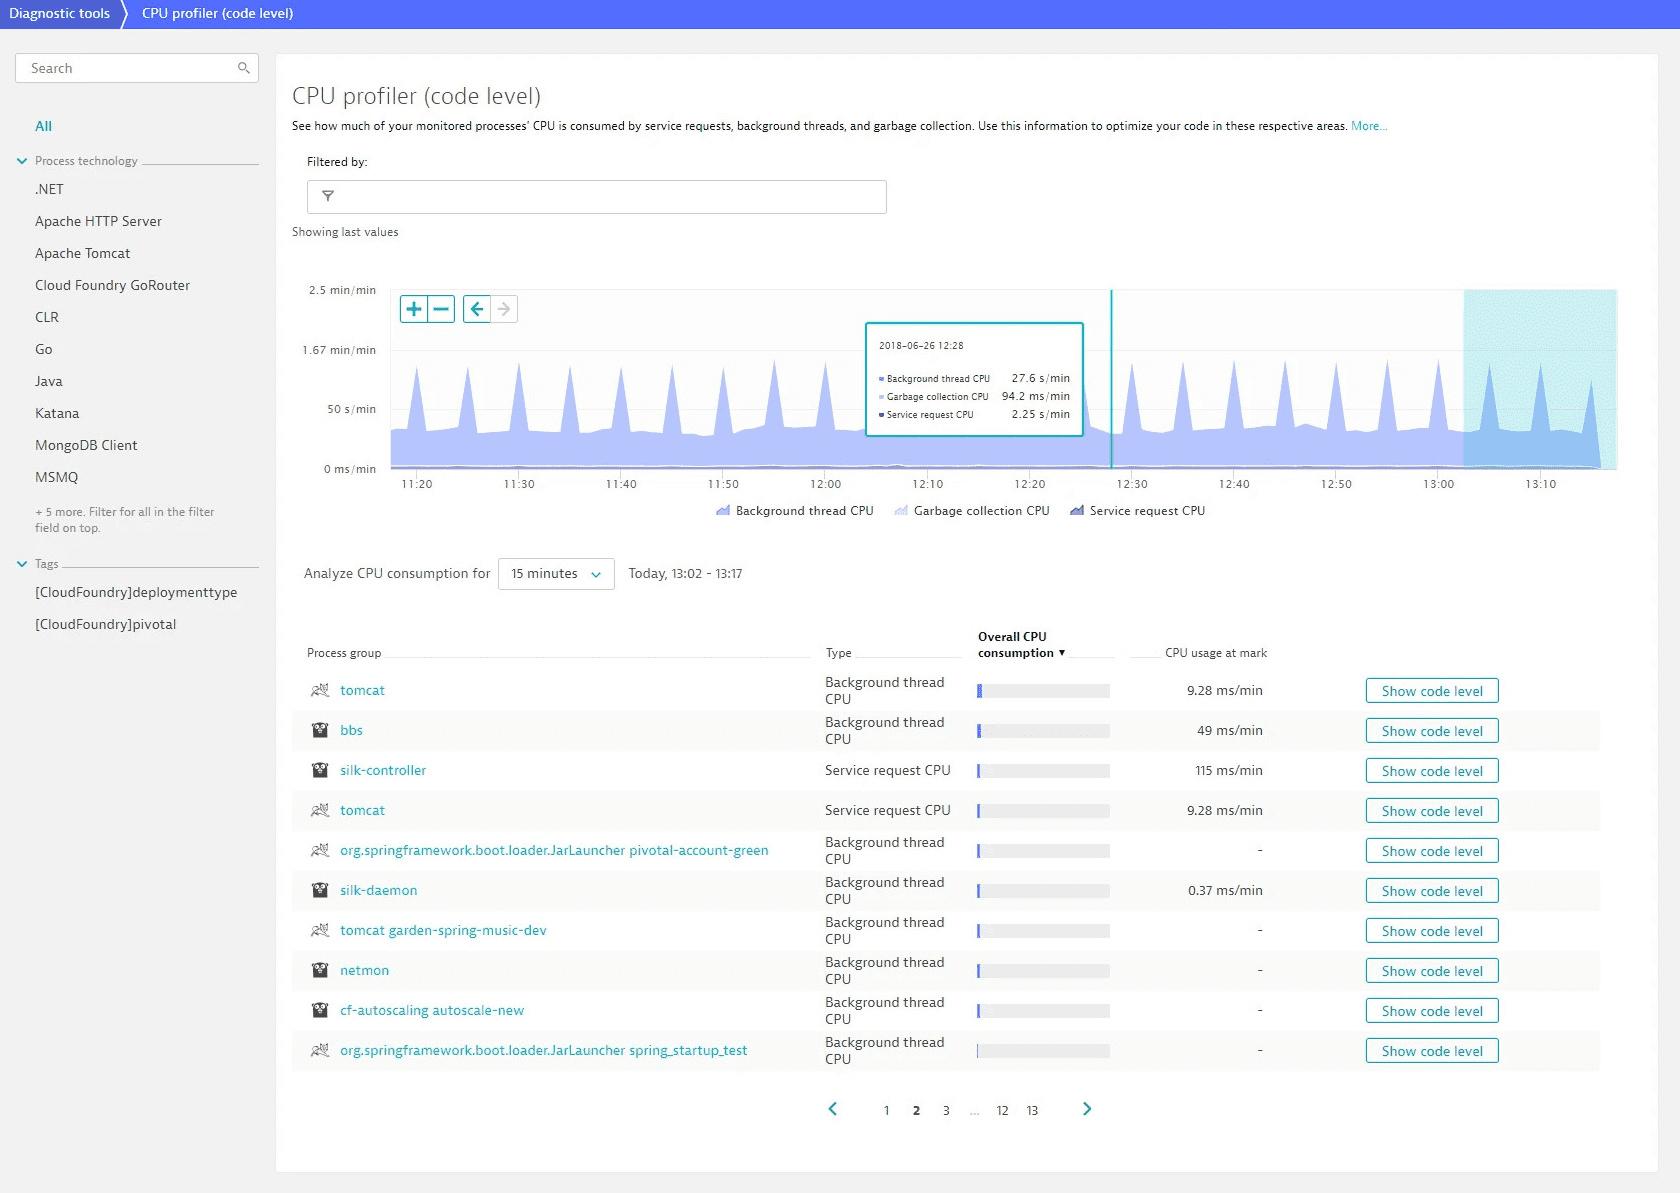 CPU profiler